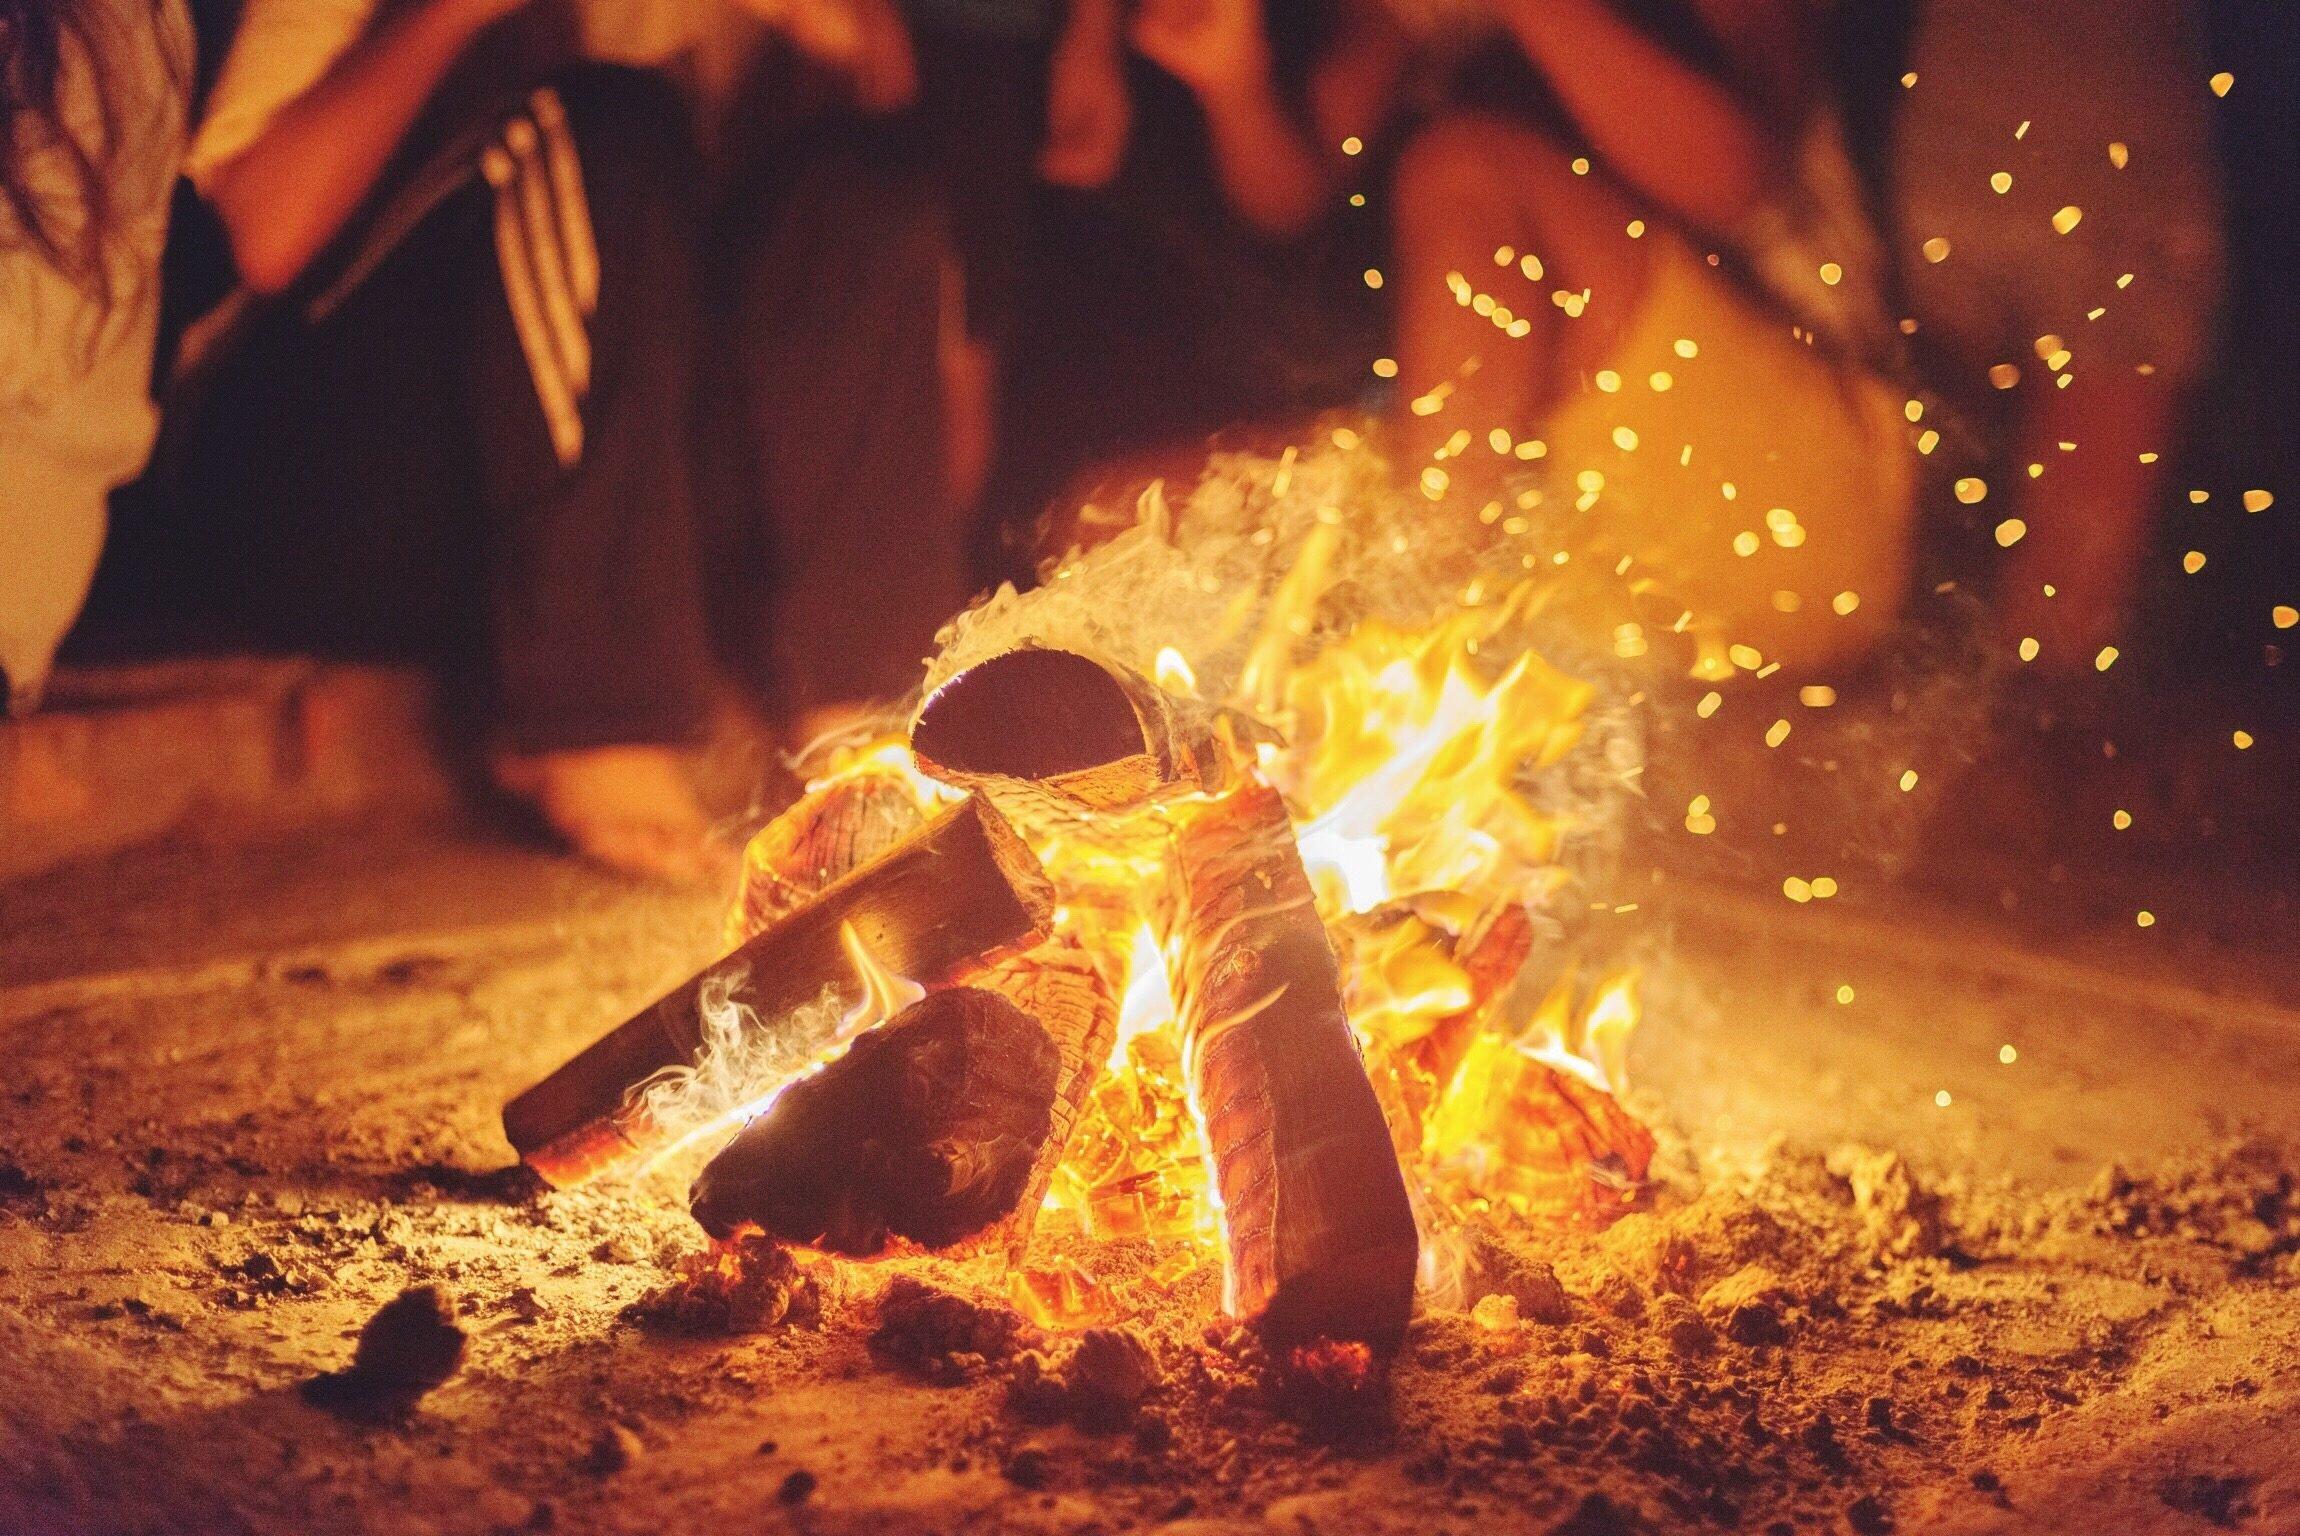 Wood Burning On Field At Night